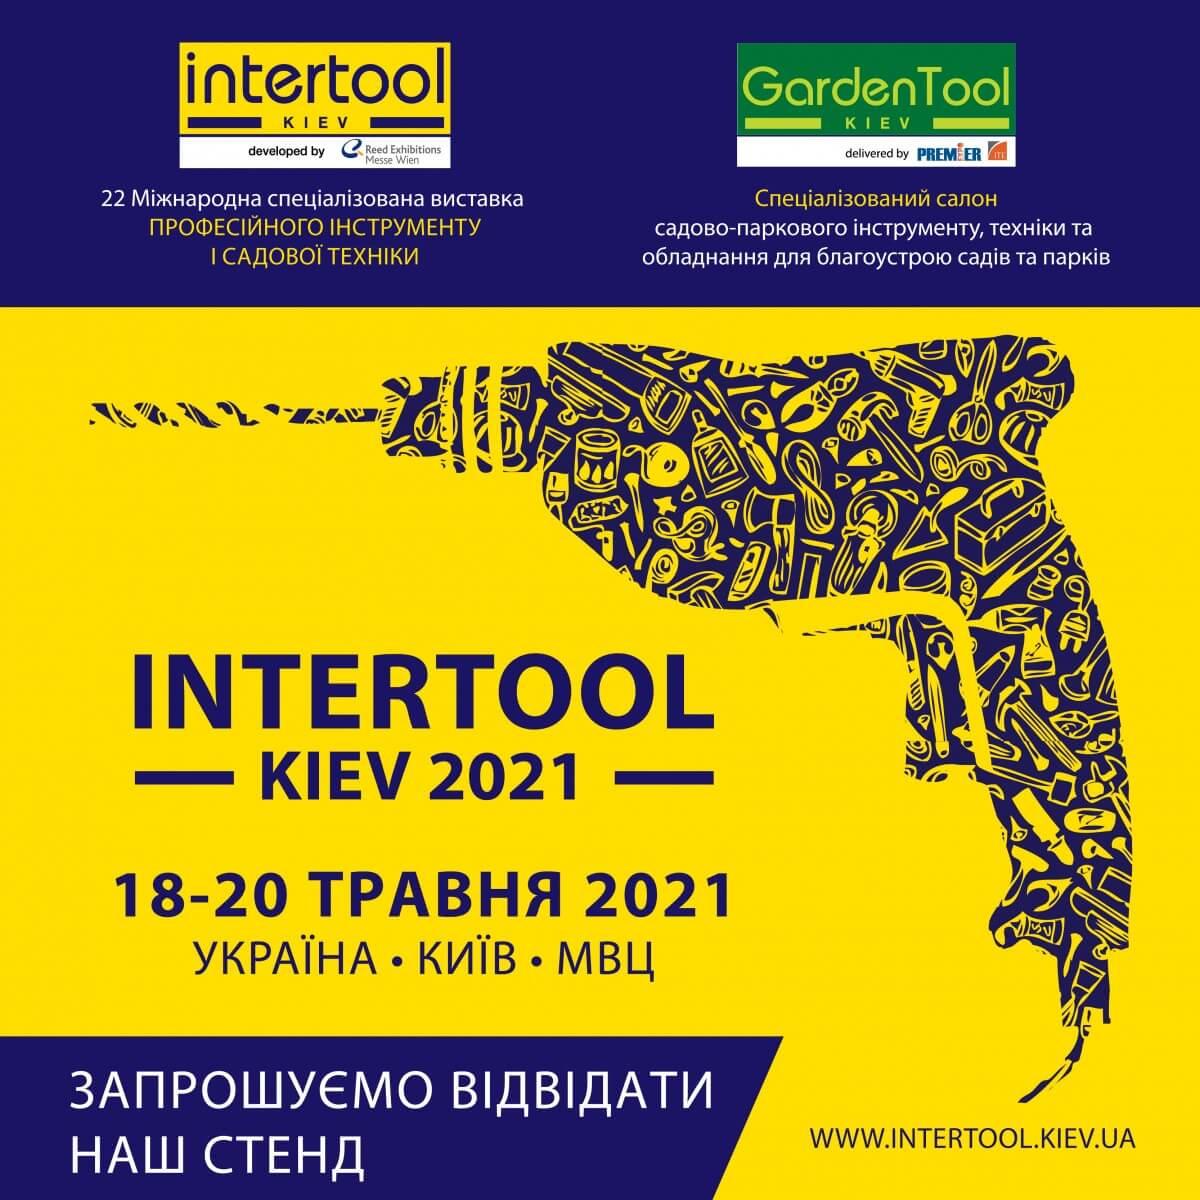 Intertool Kiev 2021